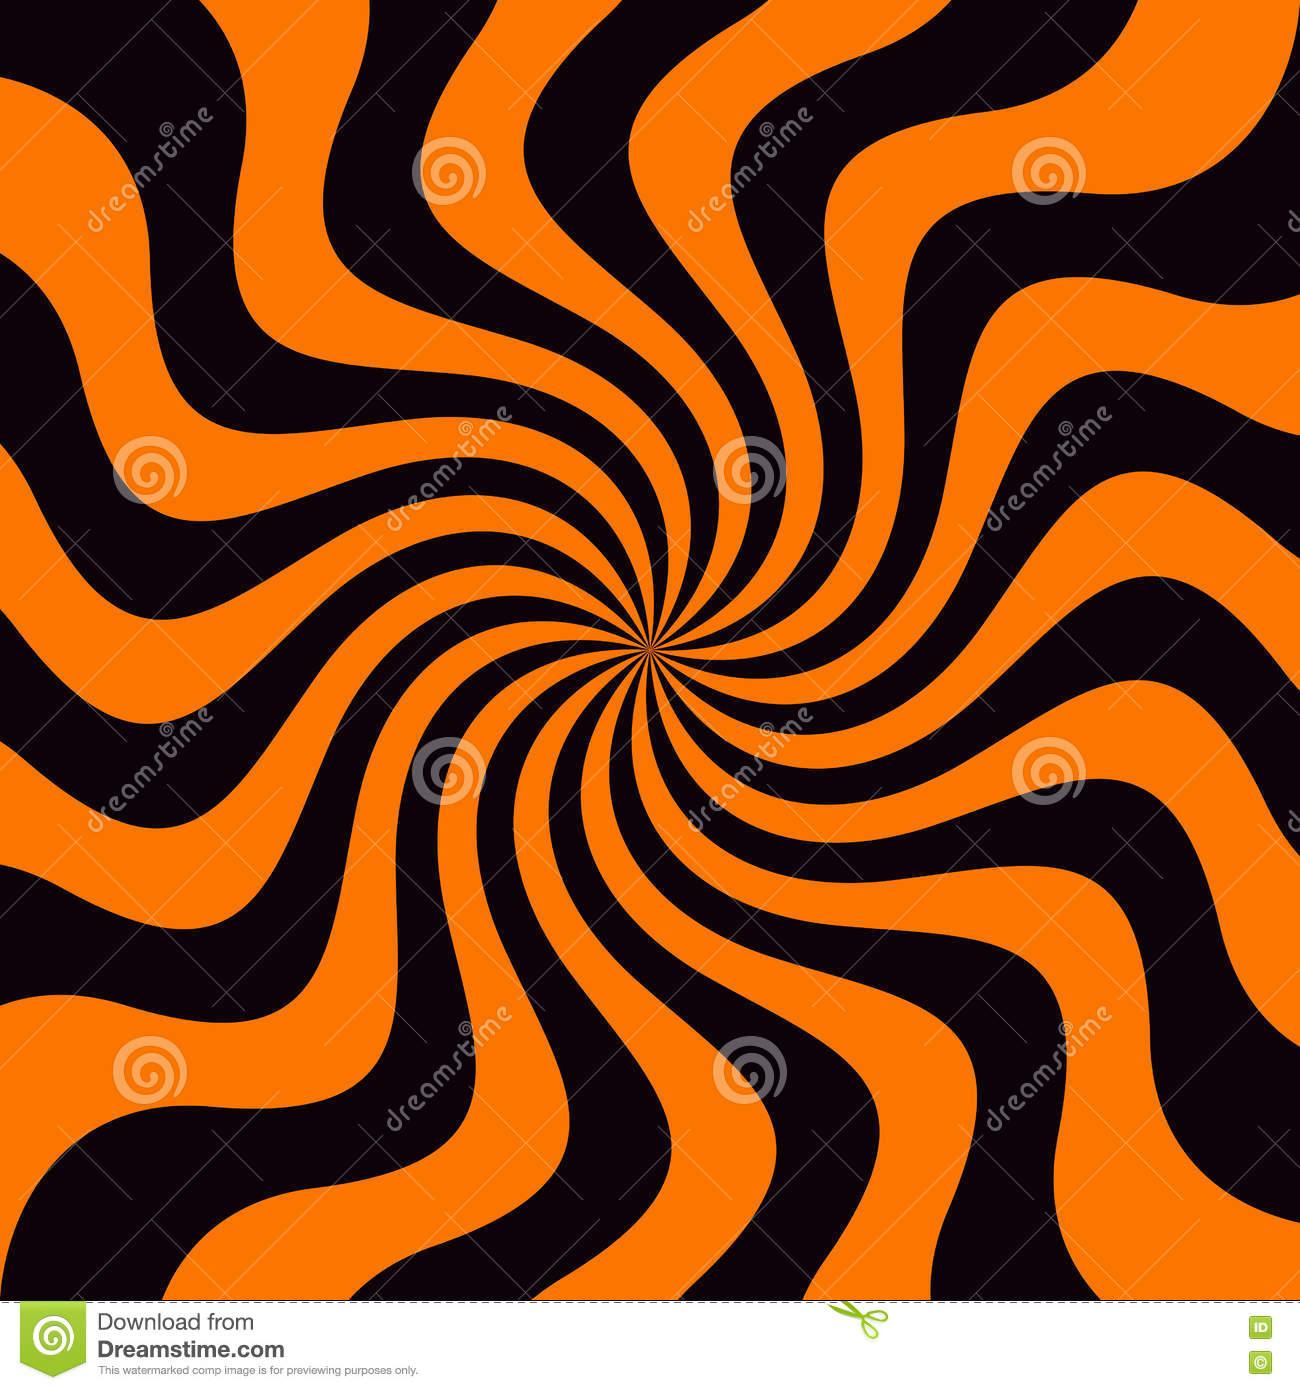 Grunge Sunbeam Background In Halloween Traditional Colors Orange 1300x1390